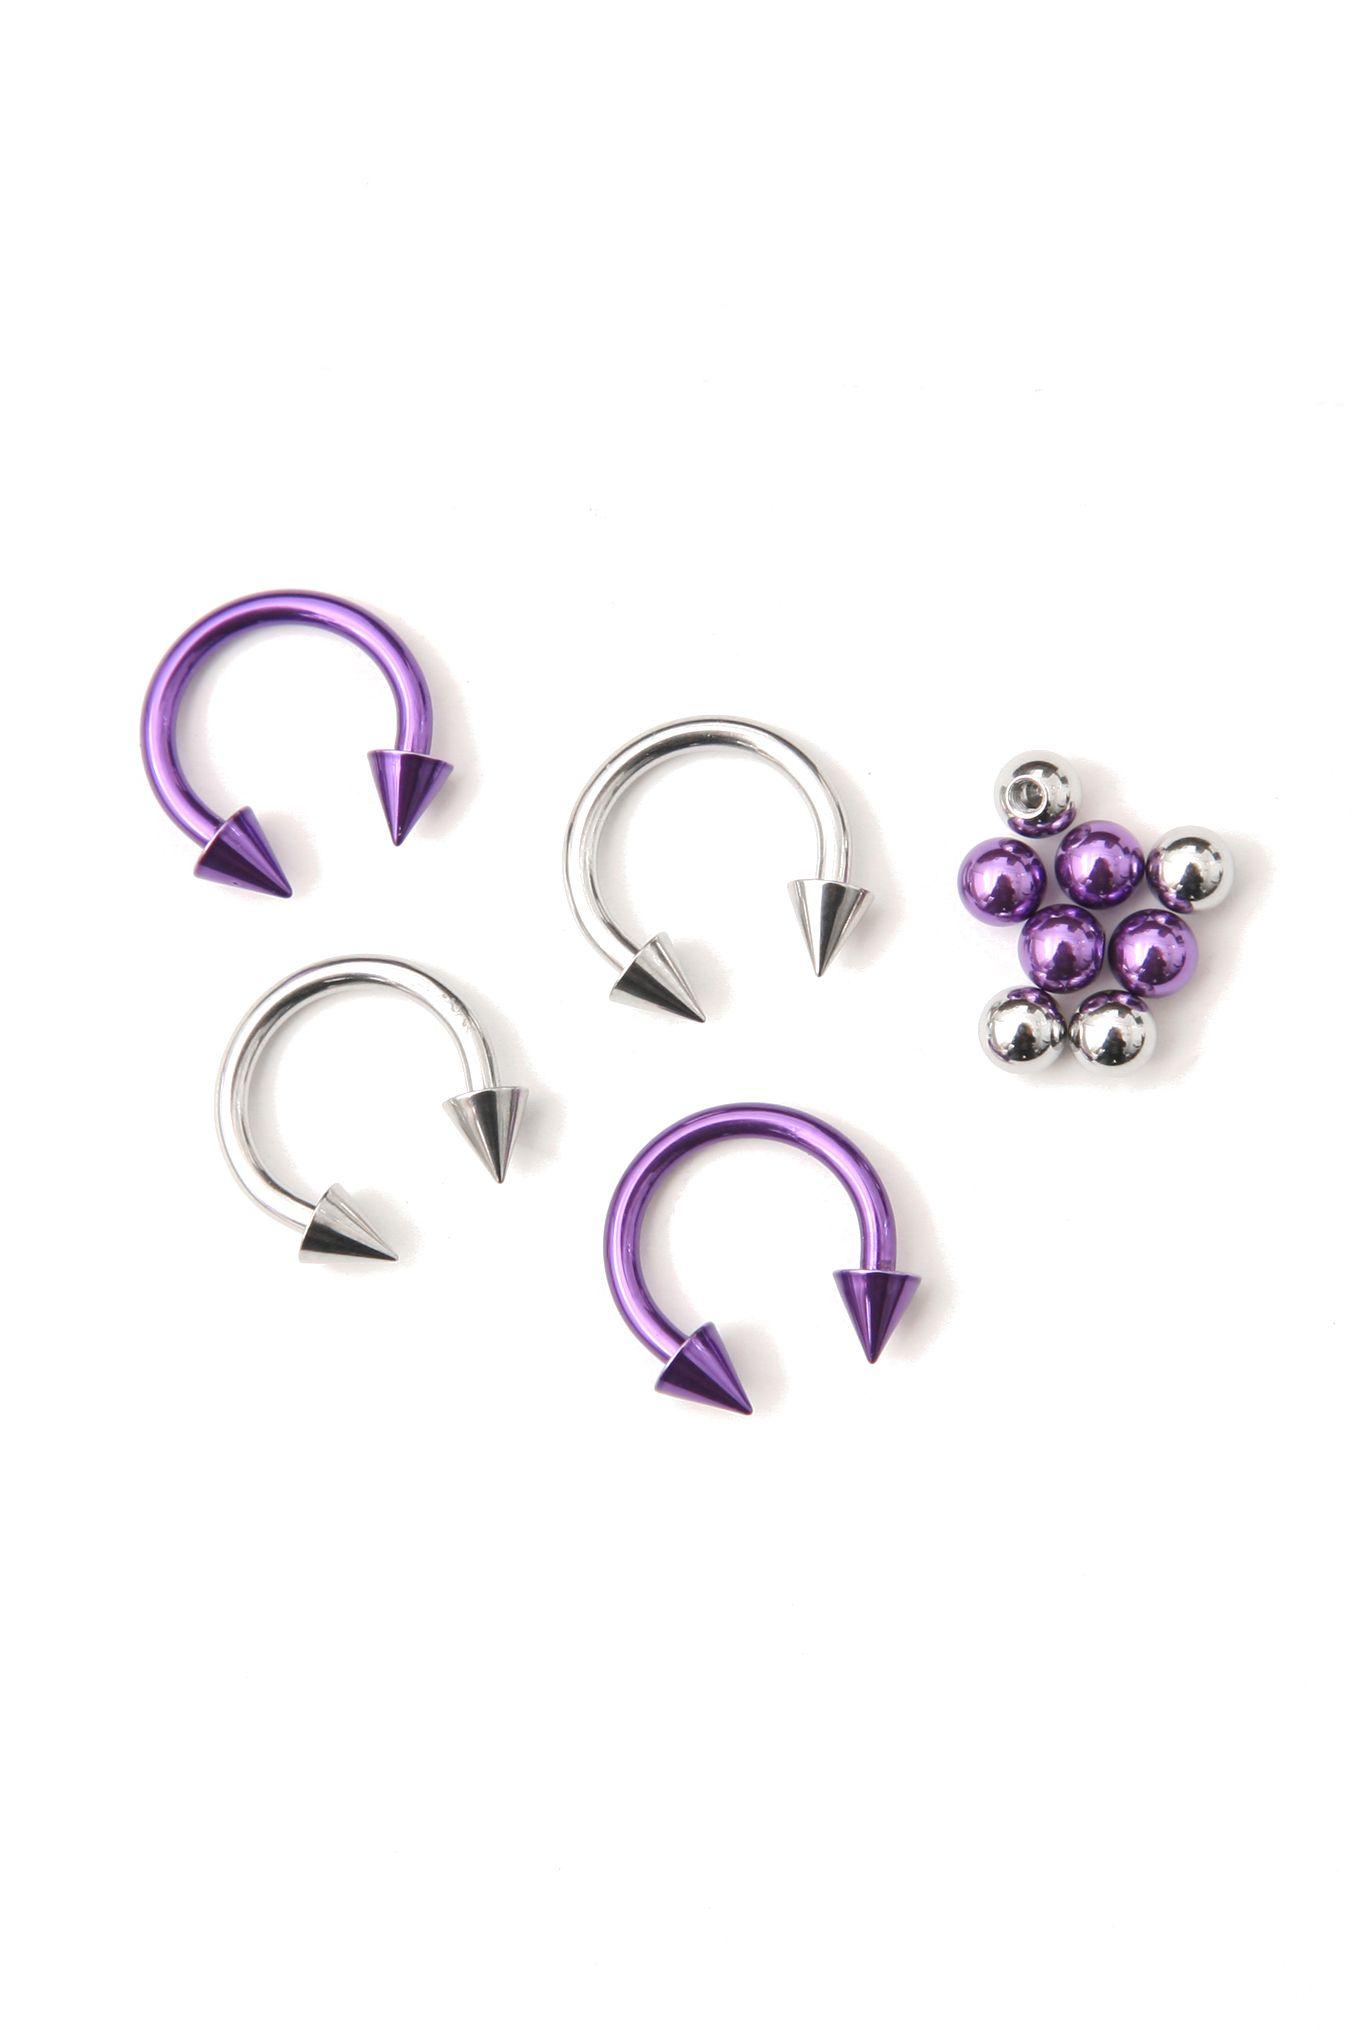 Purple Silver 3 8 Diameter Steel Circular Barbell 4 Pack Silver Circle Earrings Purple Earrings Body Jewelry